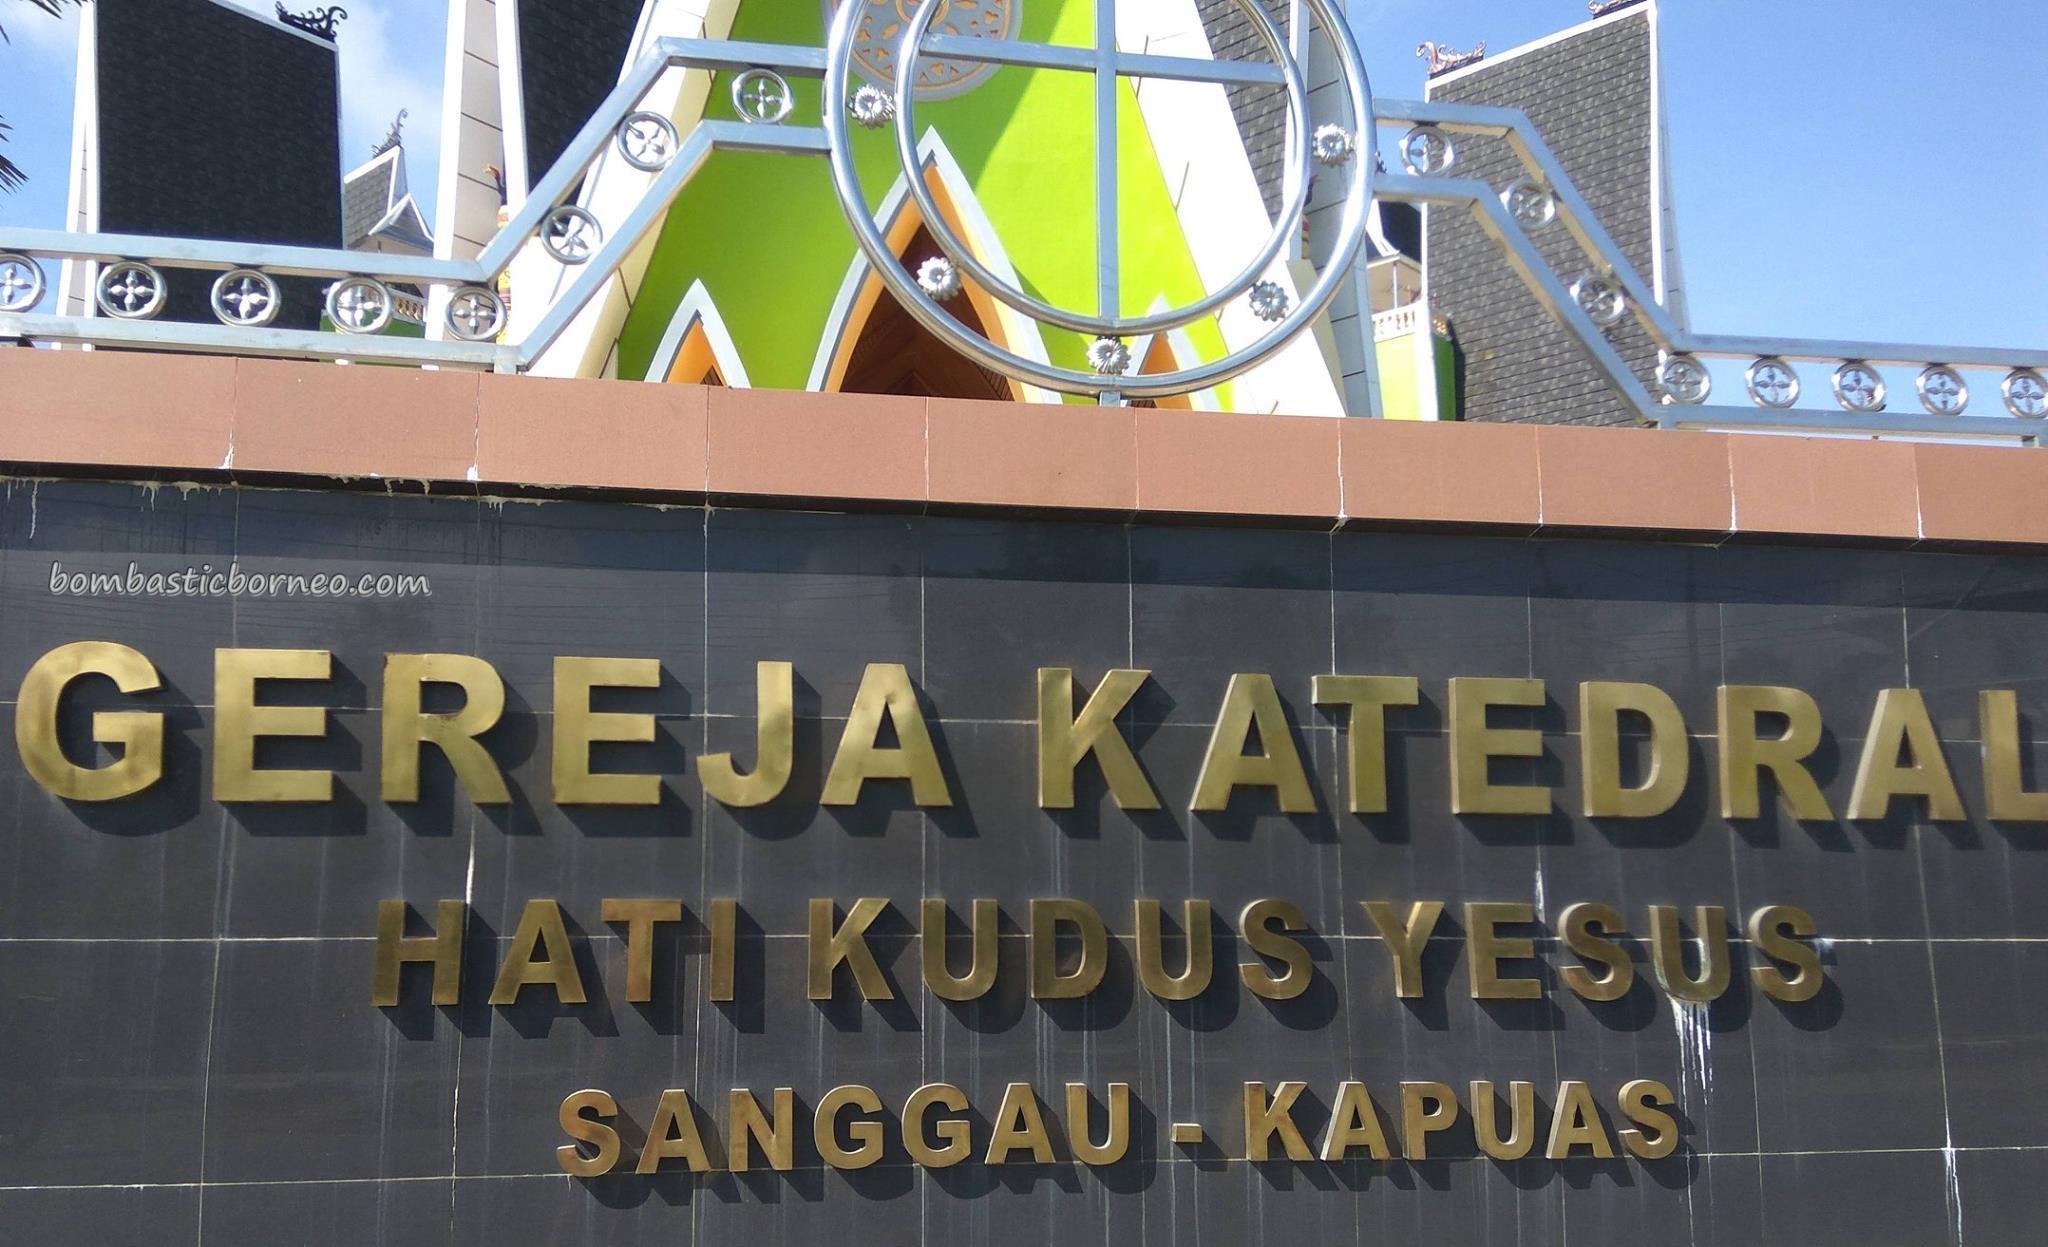 Sacred Heart of Jesus, Gereja Hati Kudus Yesus, cathedral, kristen, christian, Borneo, West Kalimantan, Obyek wisata, Tourism, travel guide, katolik, pesona, 印尼西加里曼丹, 天主教教堂